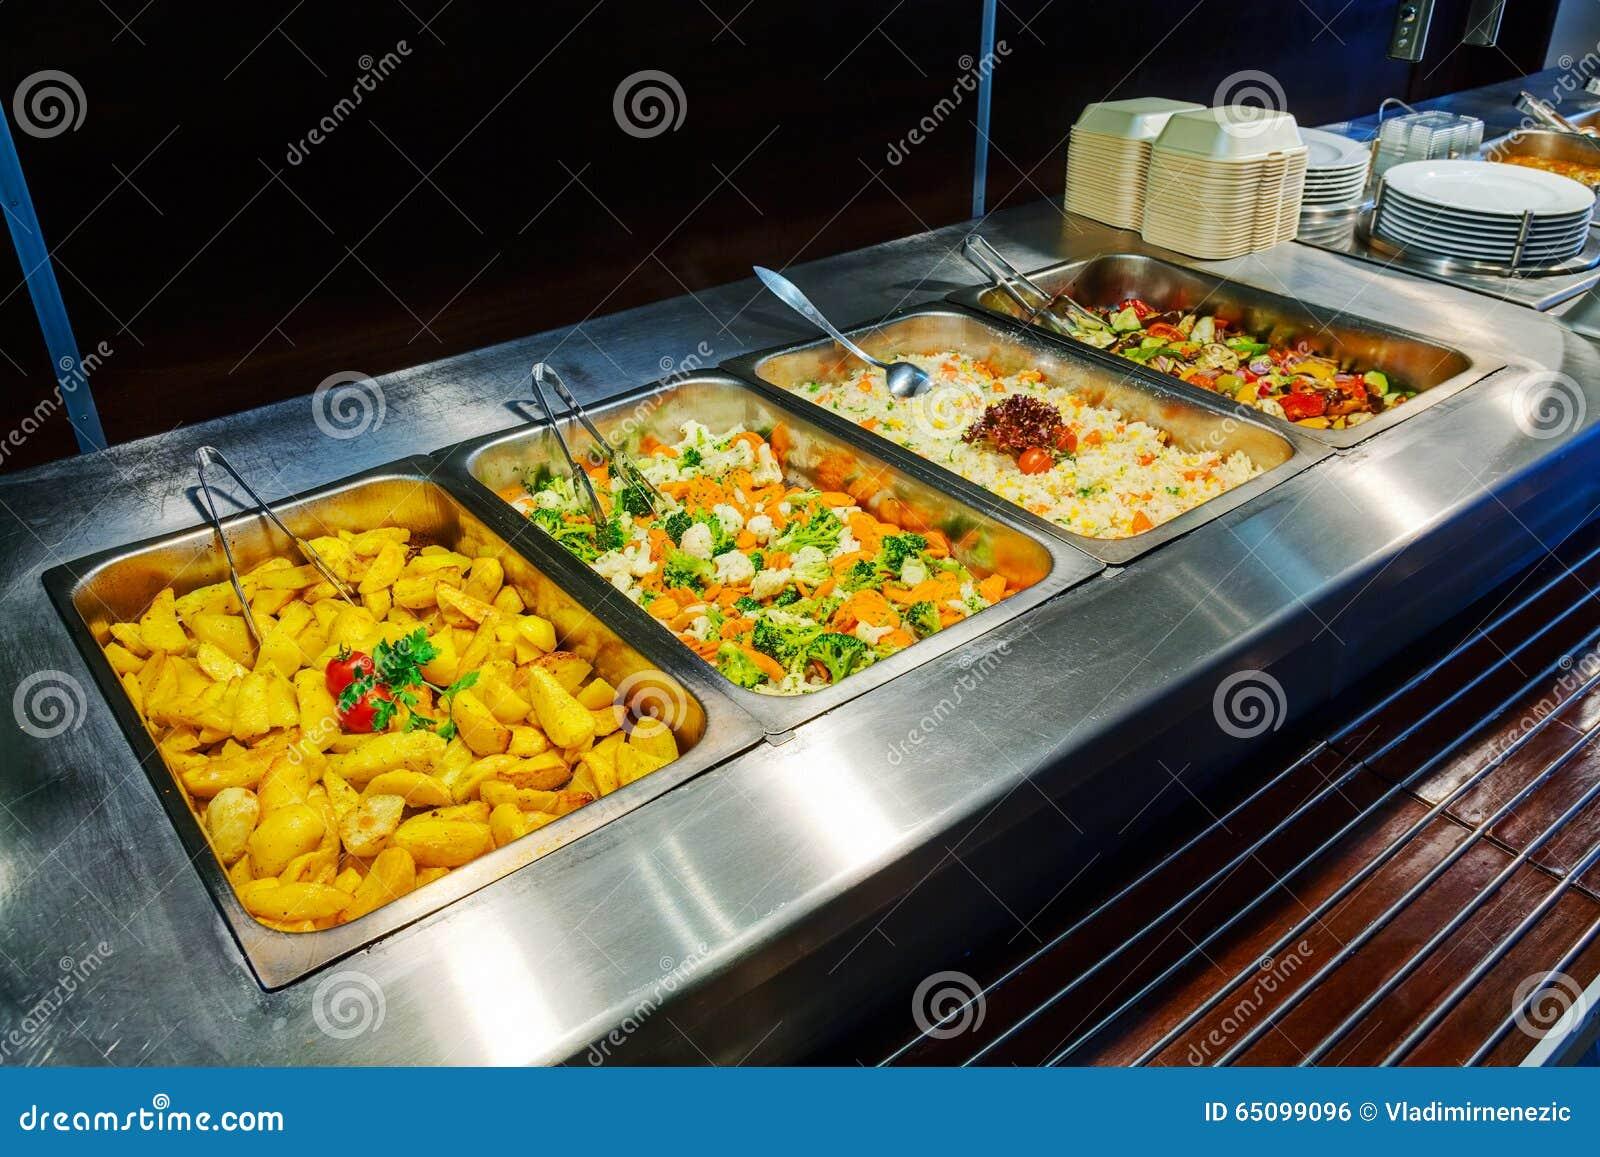 self serve restaurant business plans